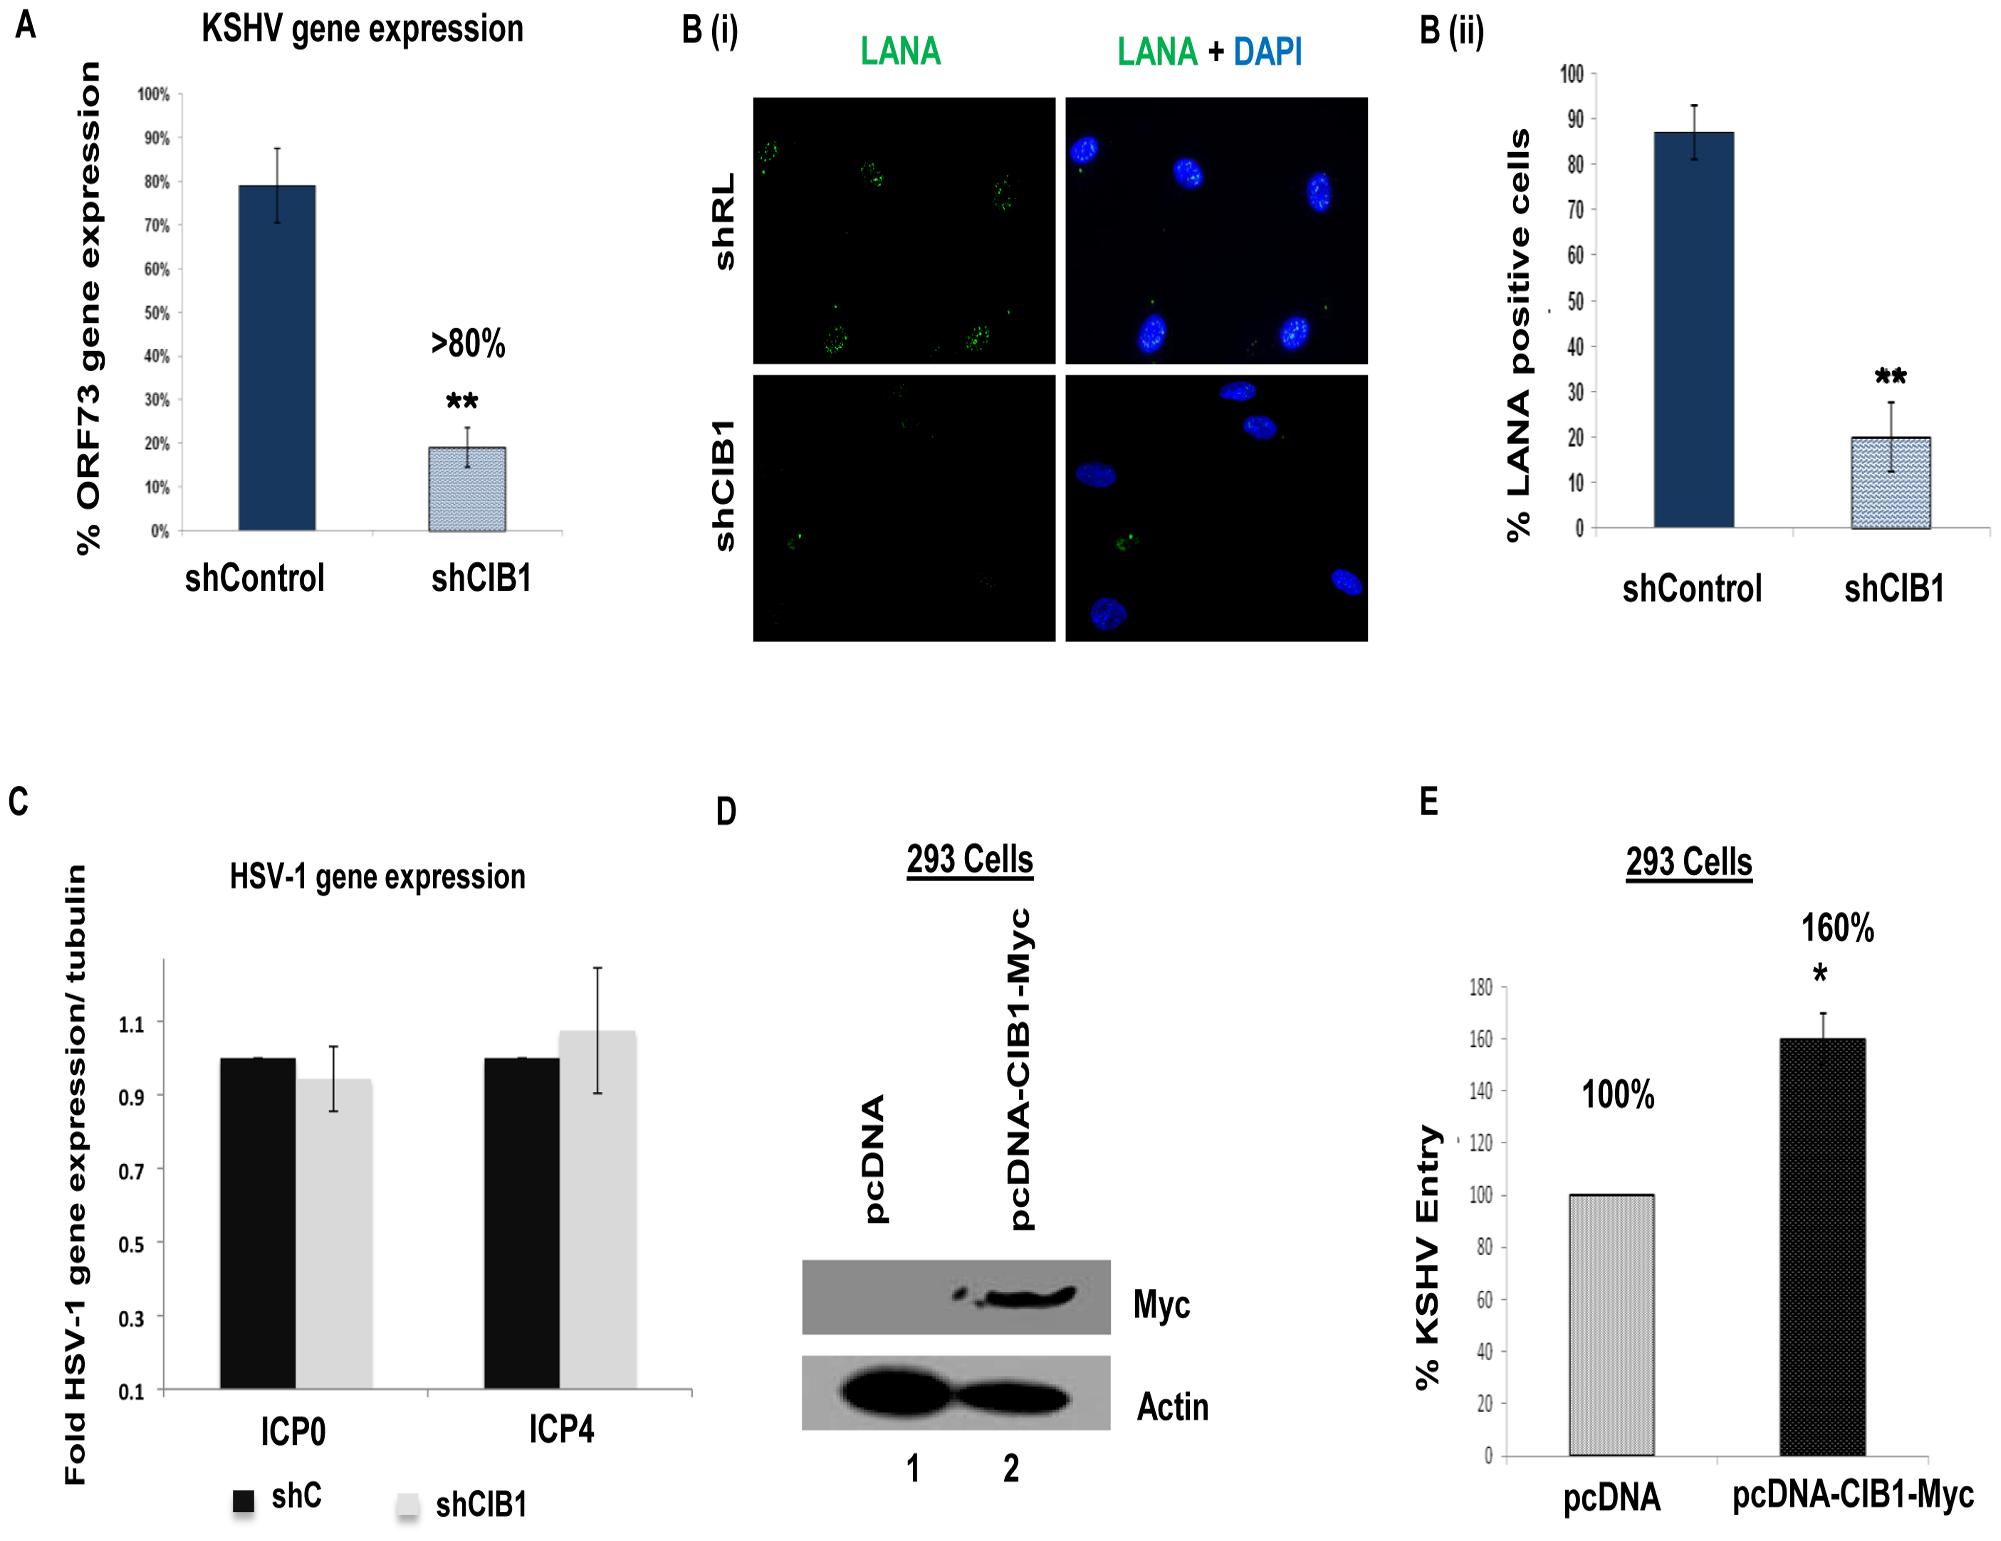 Effect of CIB1 knockdown on <i>de novo</i> KSHV infection.